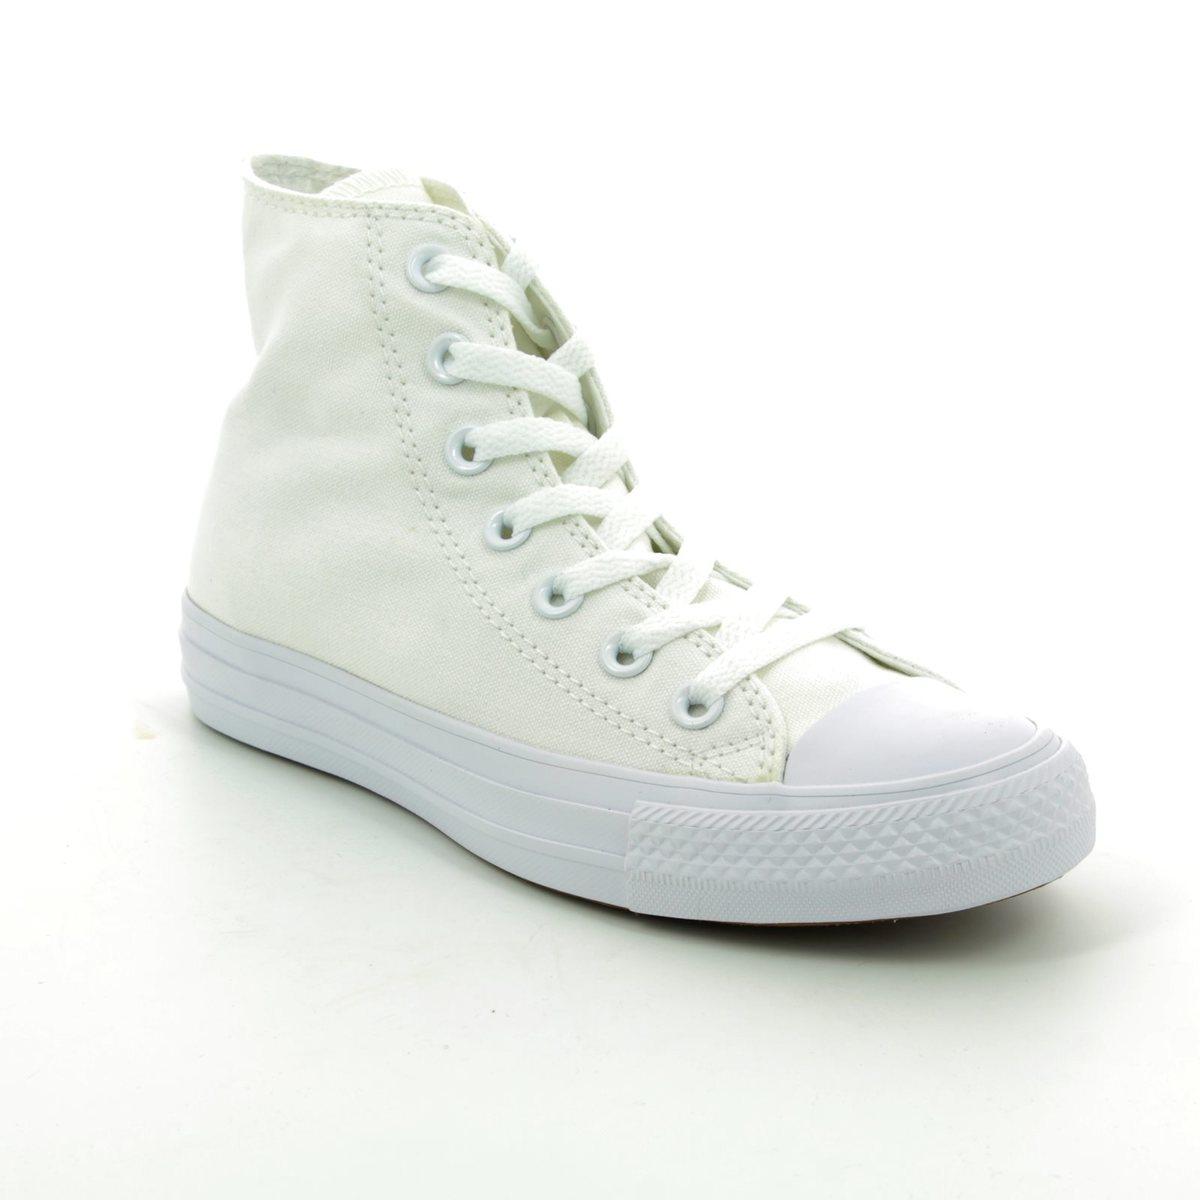 Converse Trainers - White - 1U646C Chuck Taylor All Star Hi Top Monochrome 2a1b80dd4